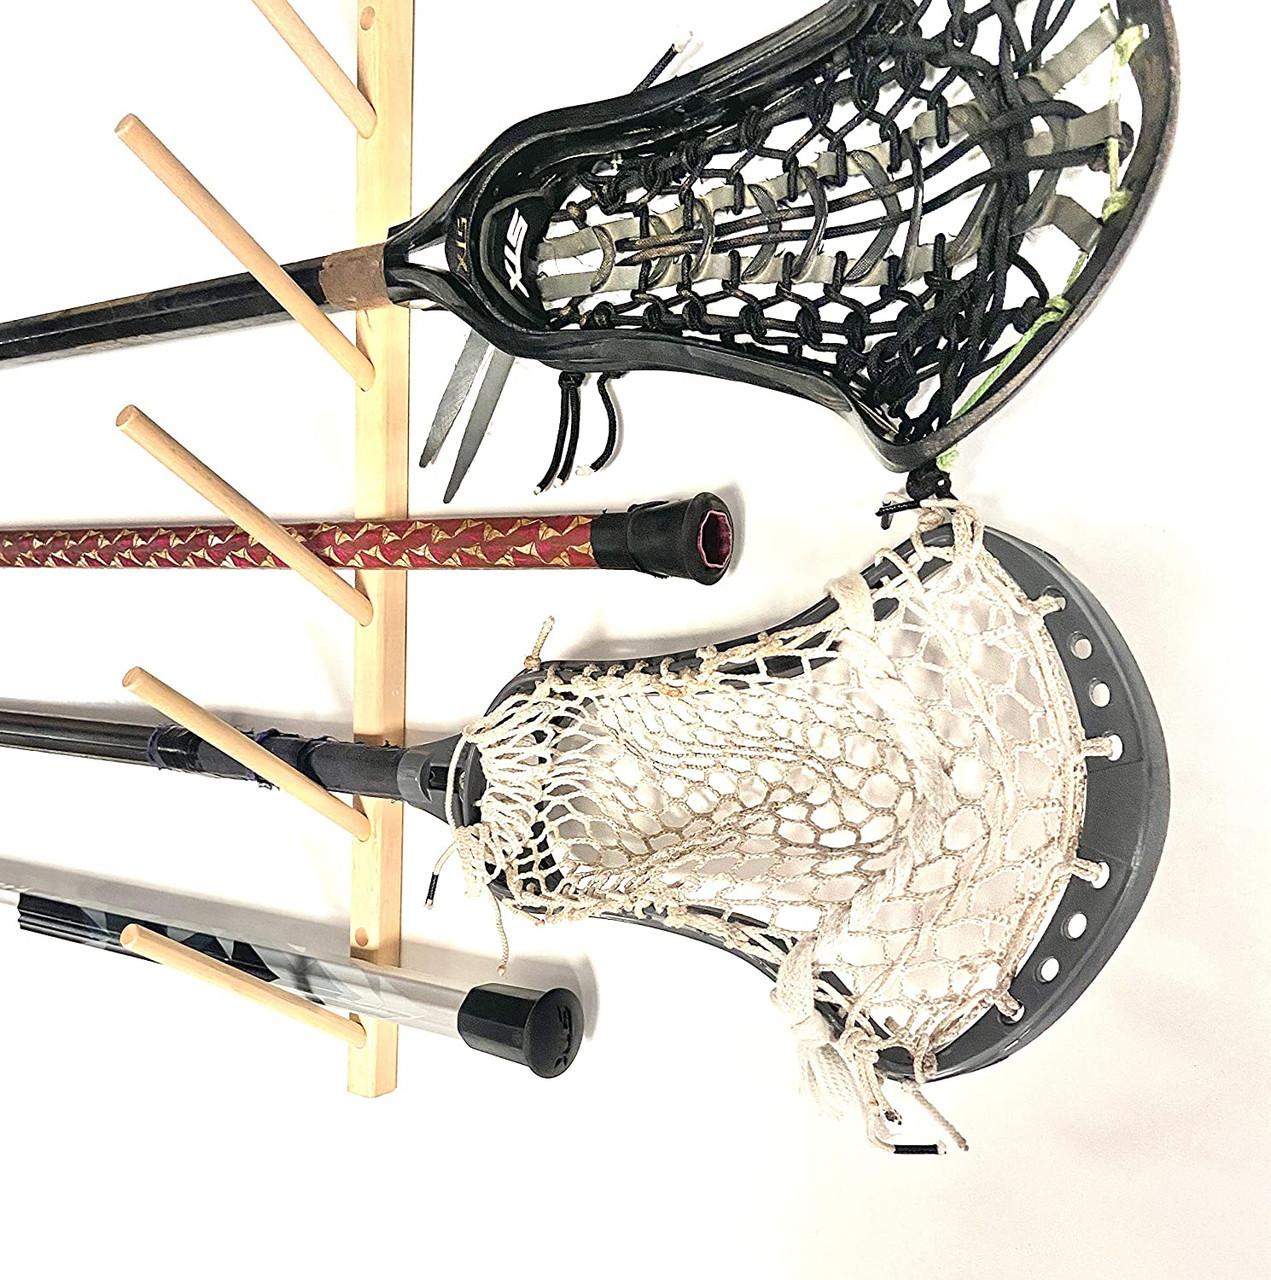 Sports Display Holder Utility Rack Baseball Bats Sticks 5 Pegs Wood Sports